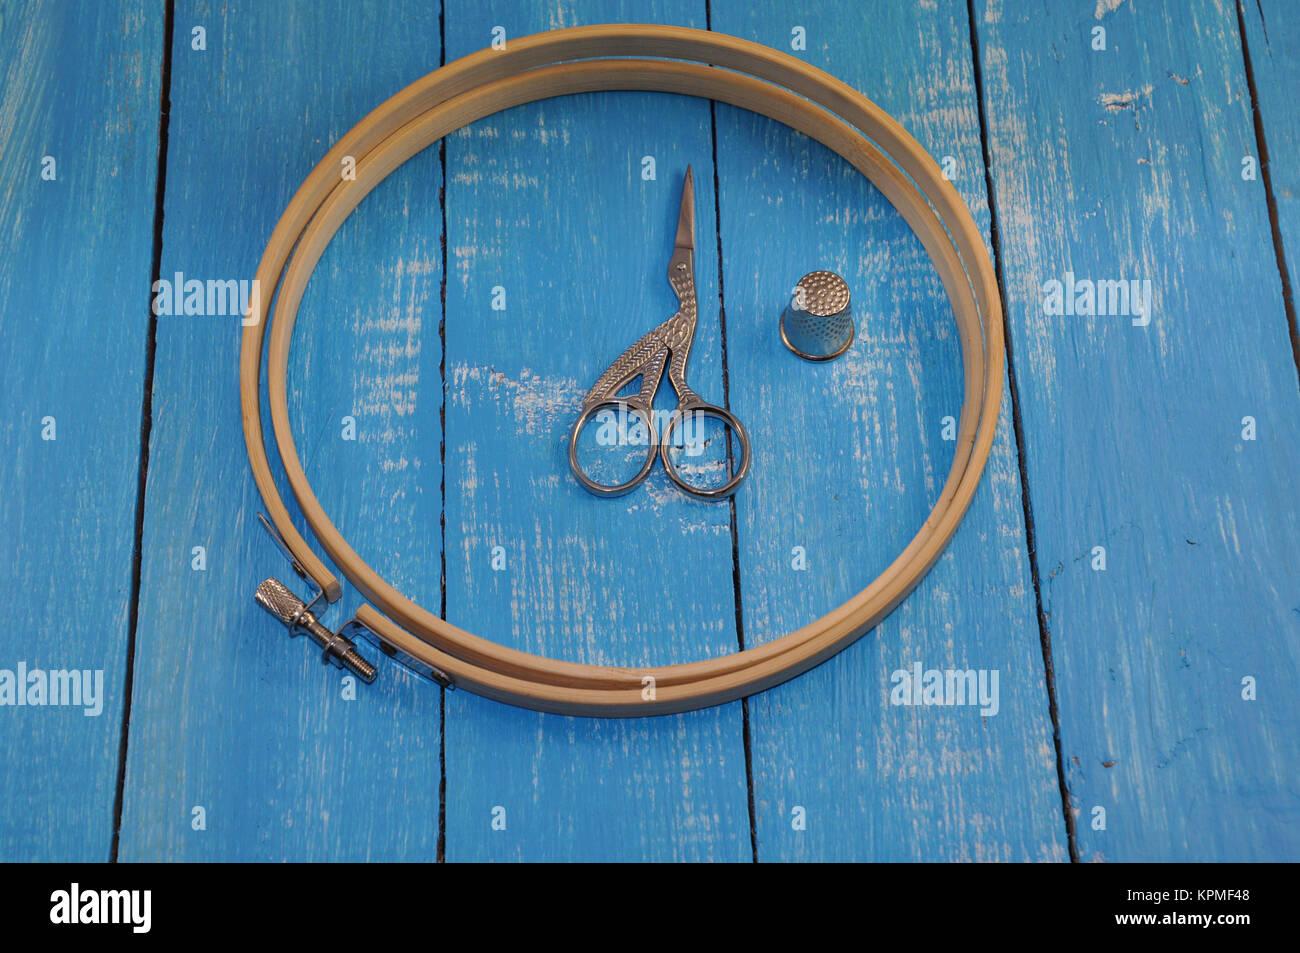 Hoop, thimble, scissors for needlework - Stock Image